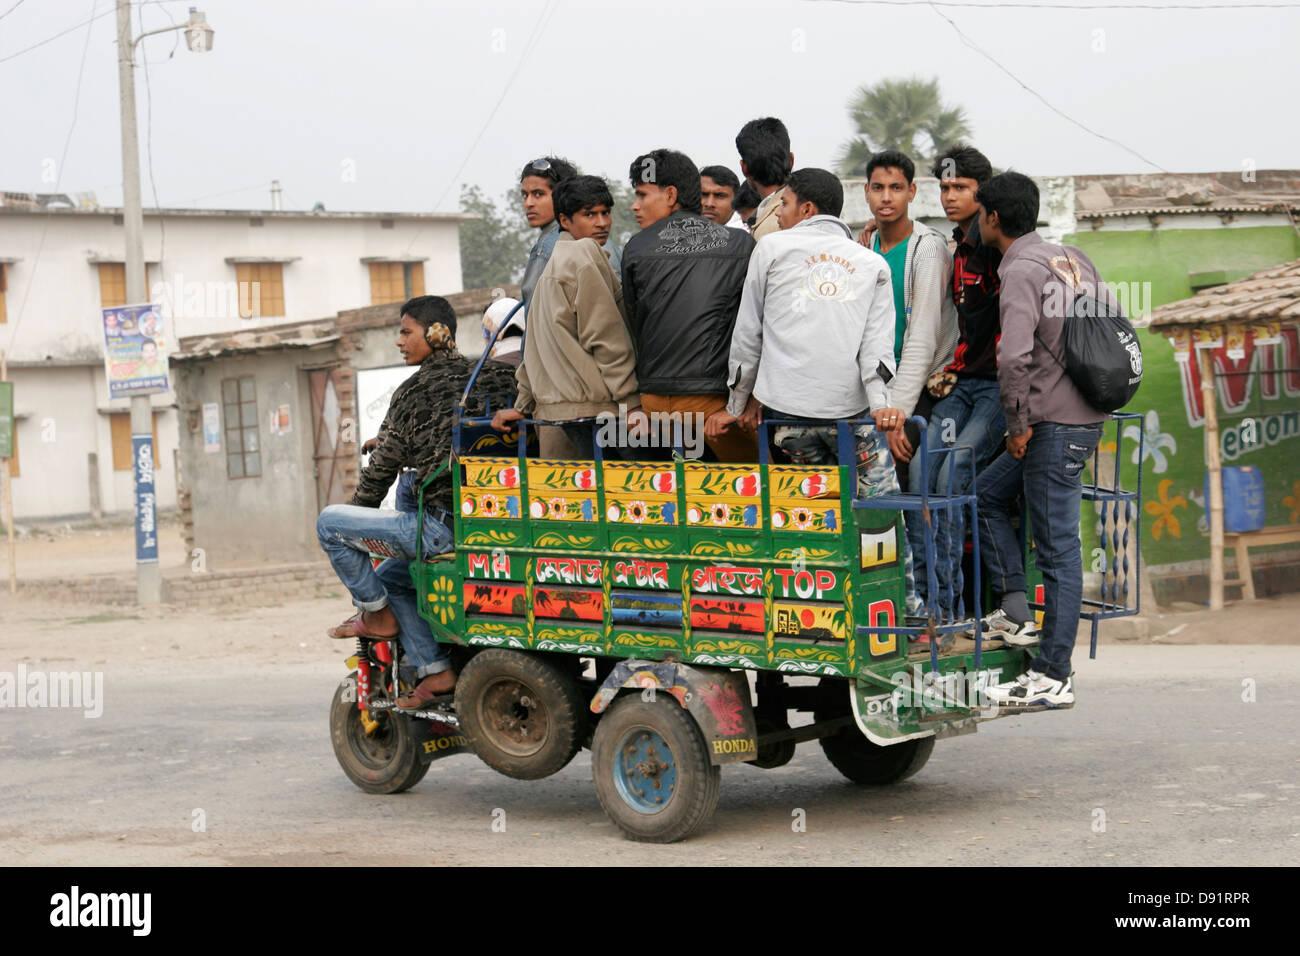 Tiny motor vehicle carrying a group of Bangladeshi men on the road in rural Bangladesh - Stock Image